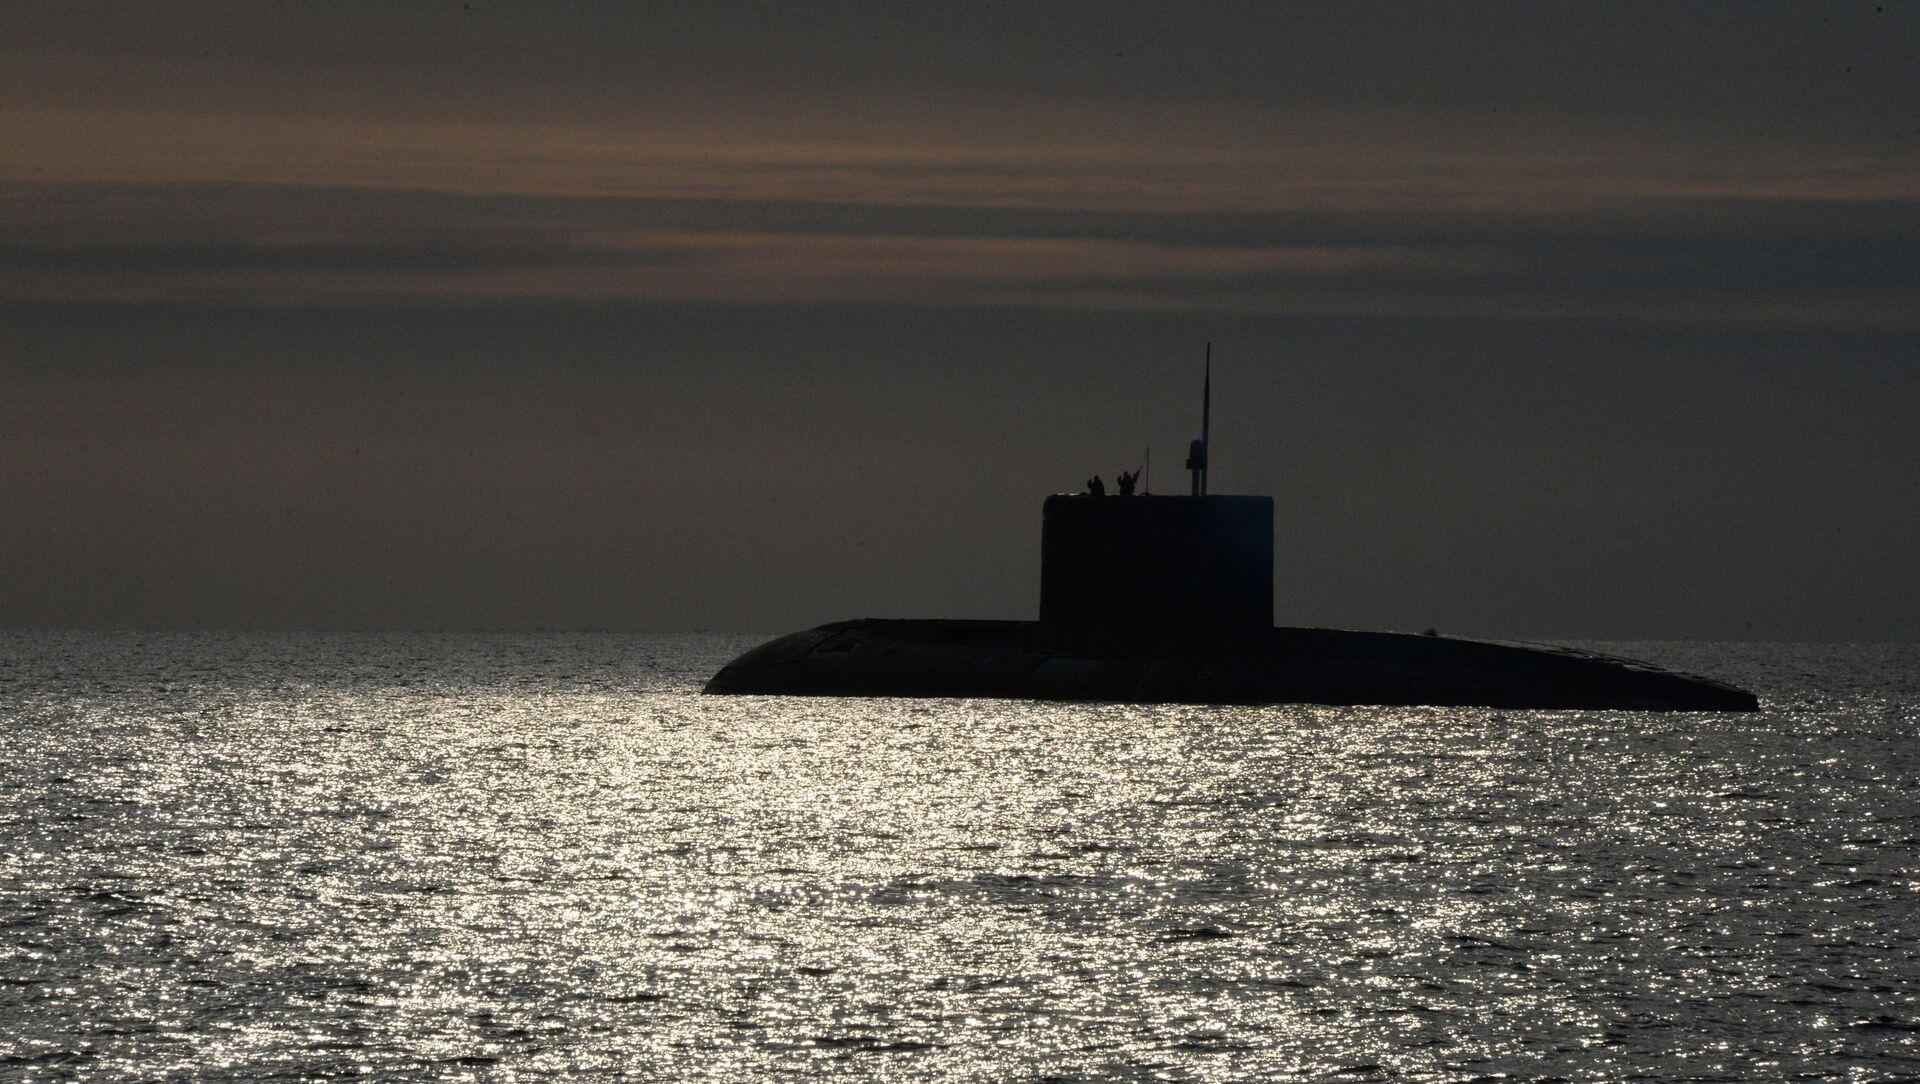 Un submarino (imagen referencial) - Sputnik Mundo, 1920, 02.02.2021